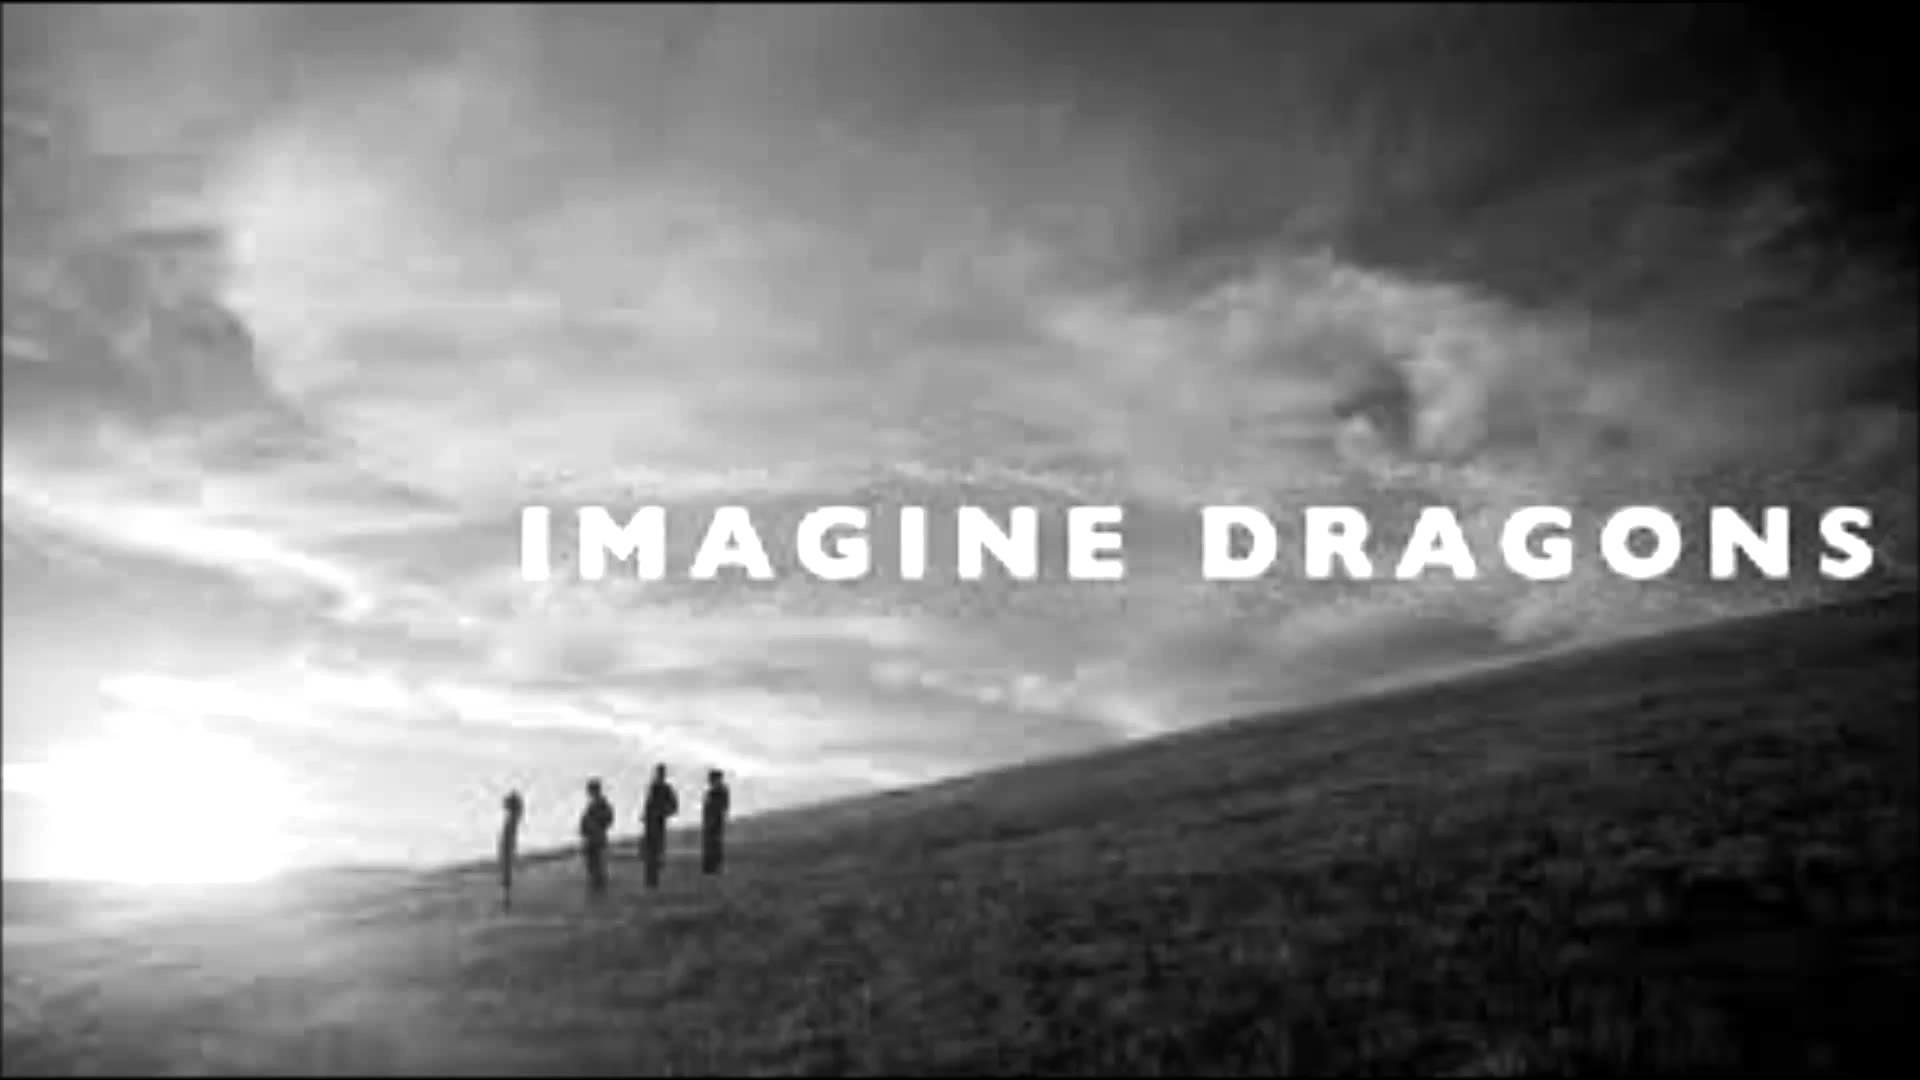 imagine wallpaper 72 images